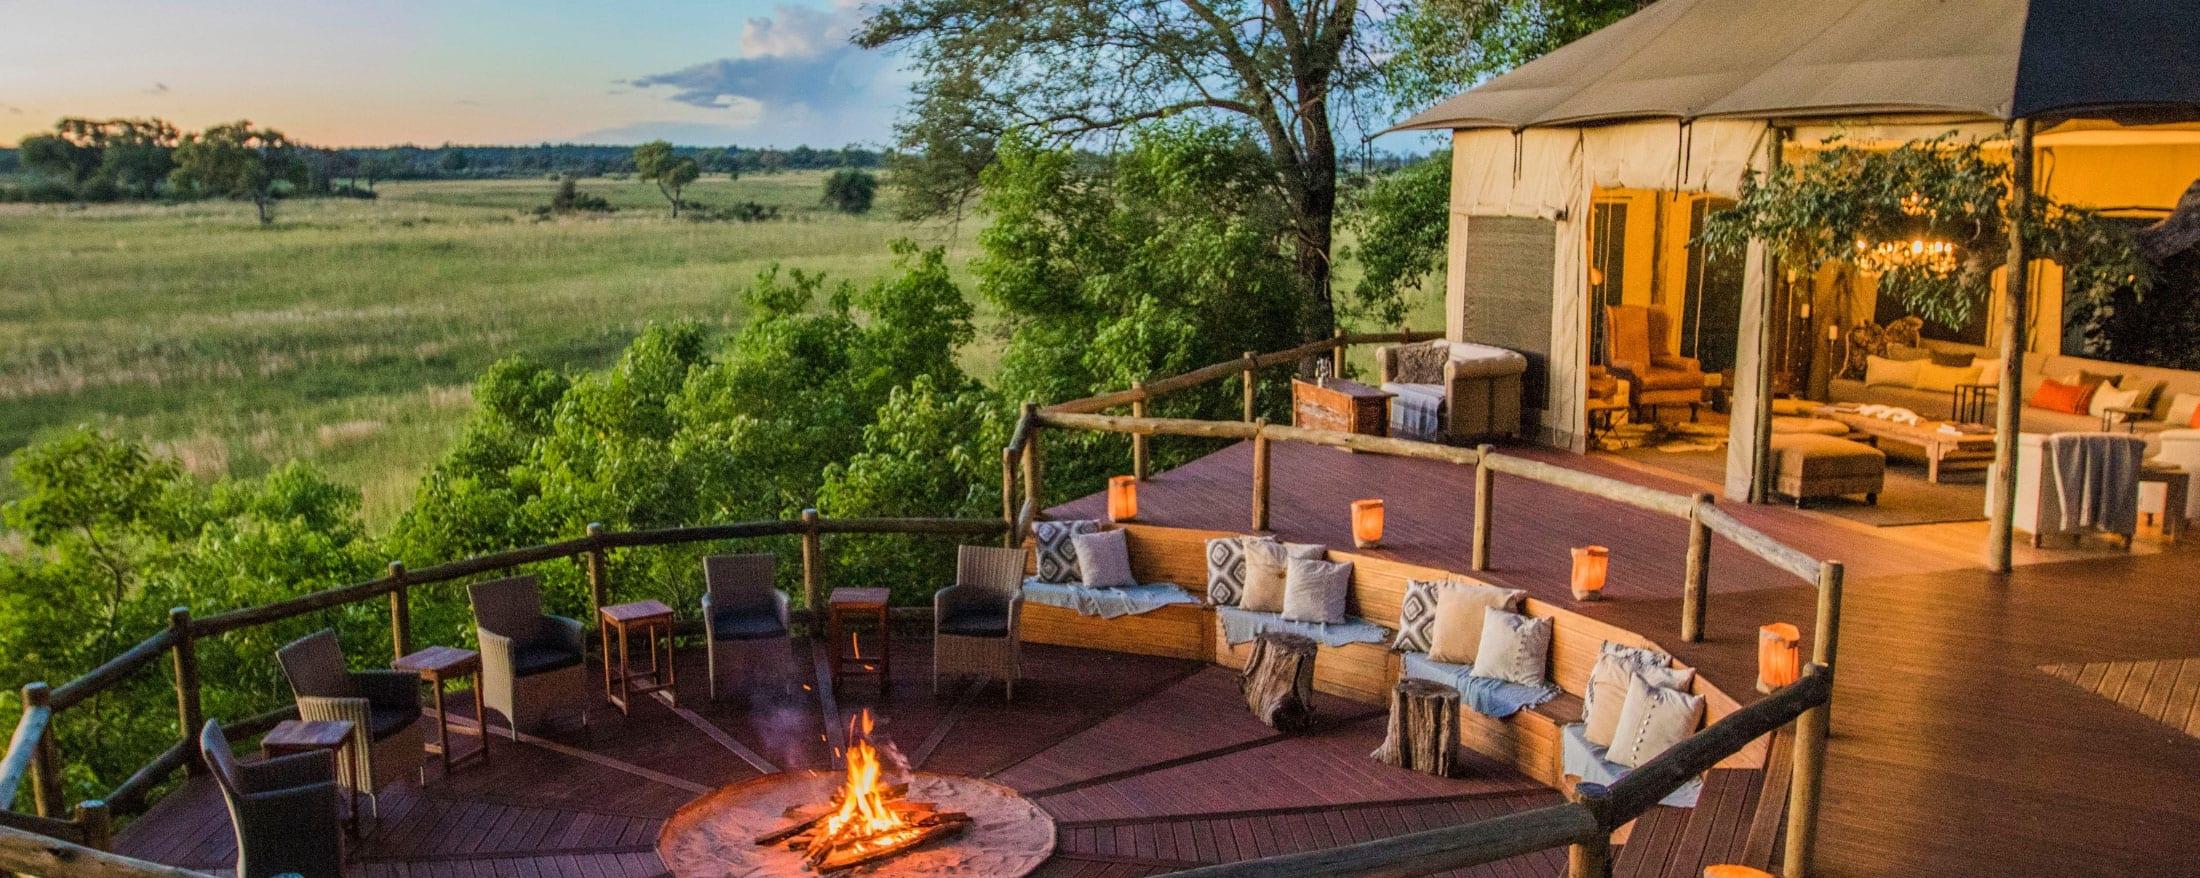 luxury namibia safari lodge nambwa